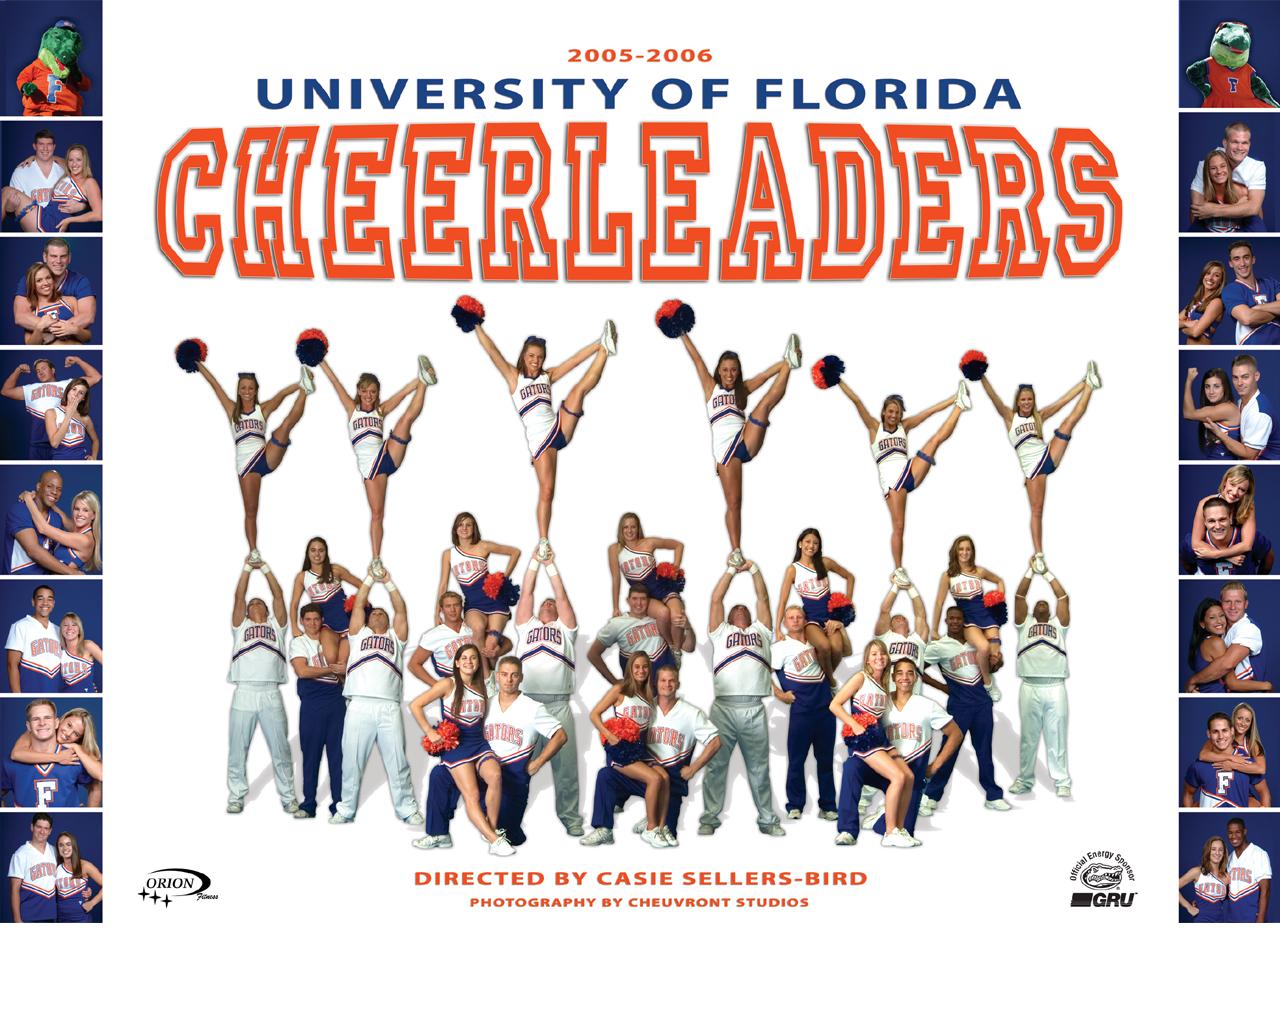 cheerleaders washington university florida cheerleading wallpaper 1280x1024